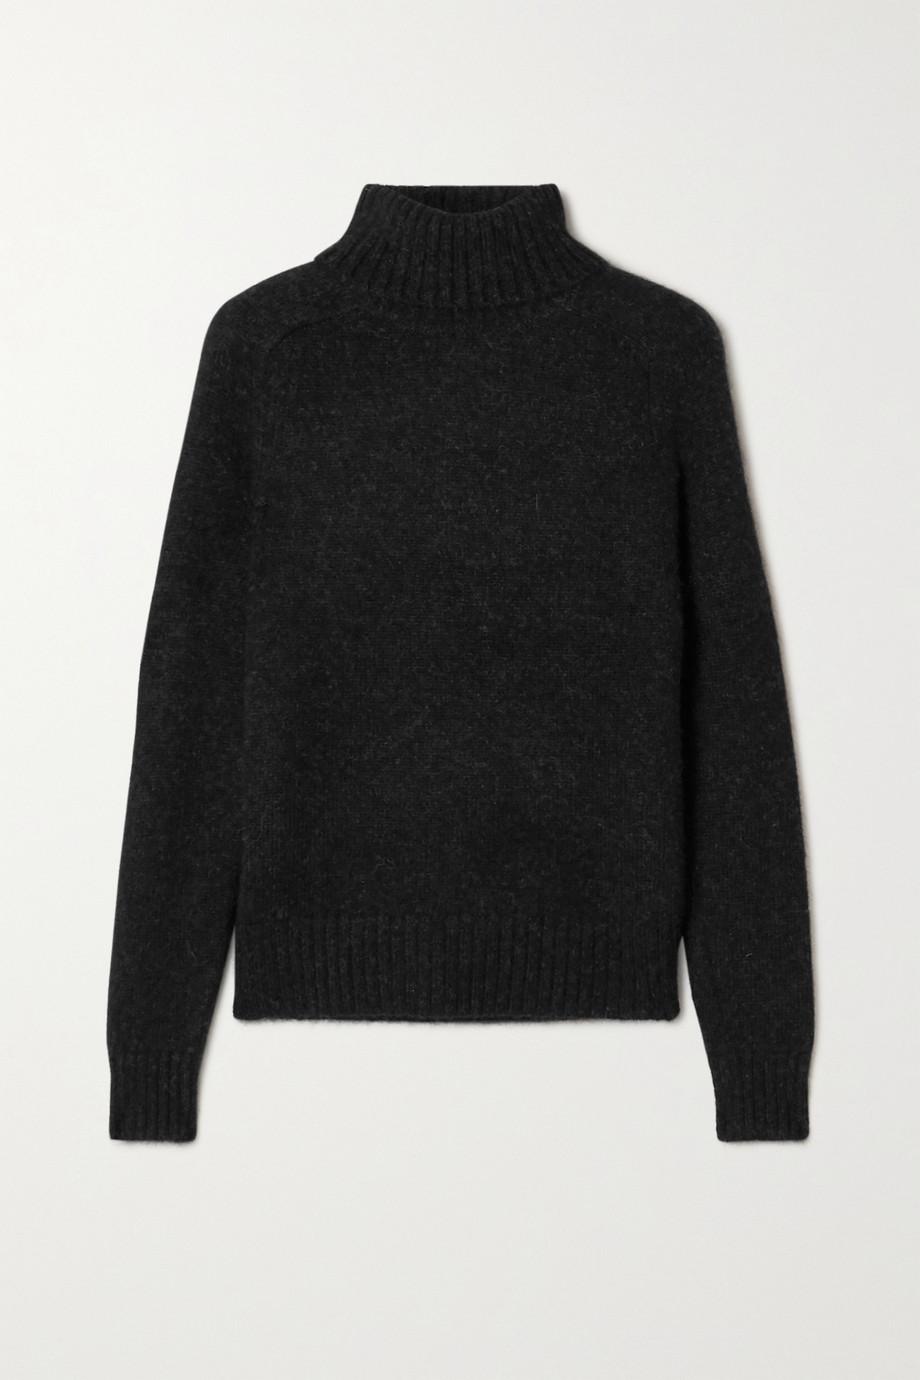 Nili Lotan Atwood alpaca-blend turtleneck sweater